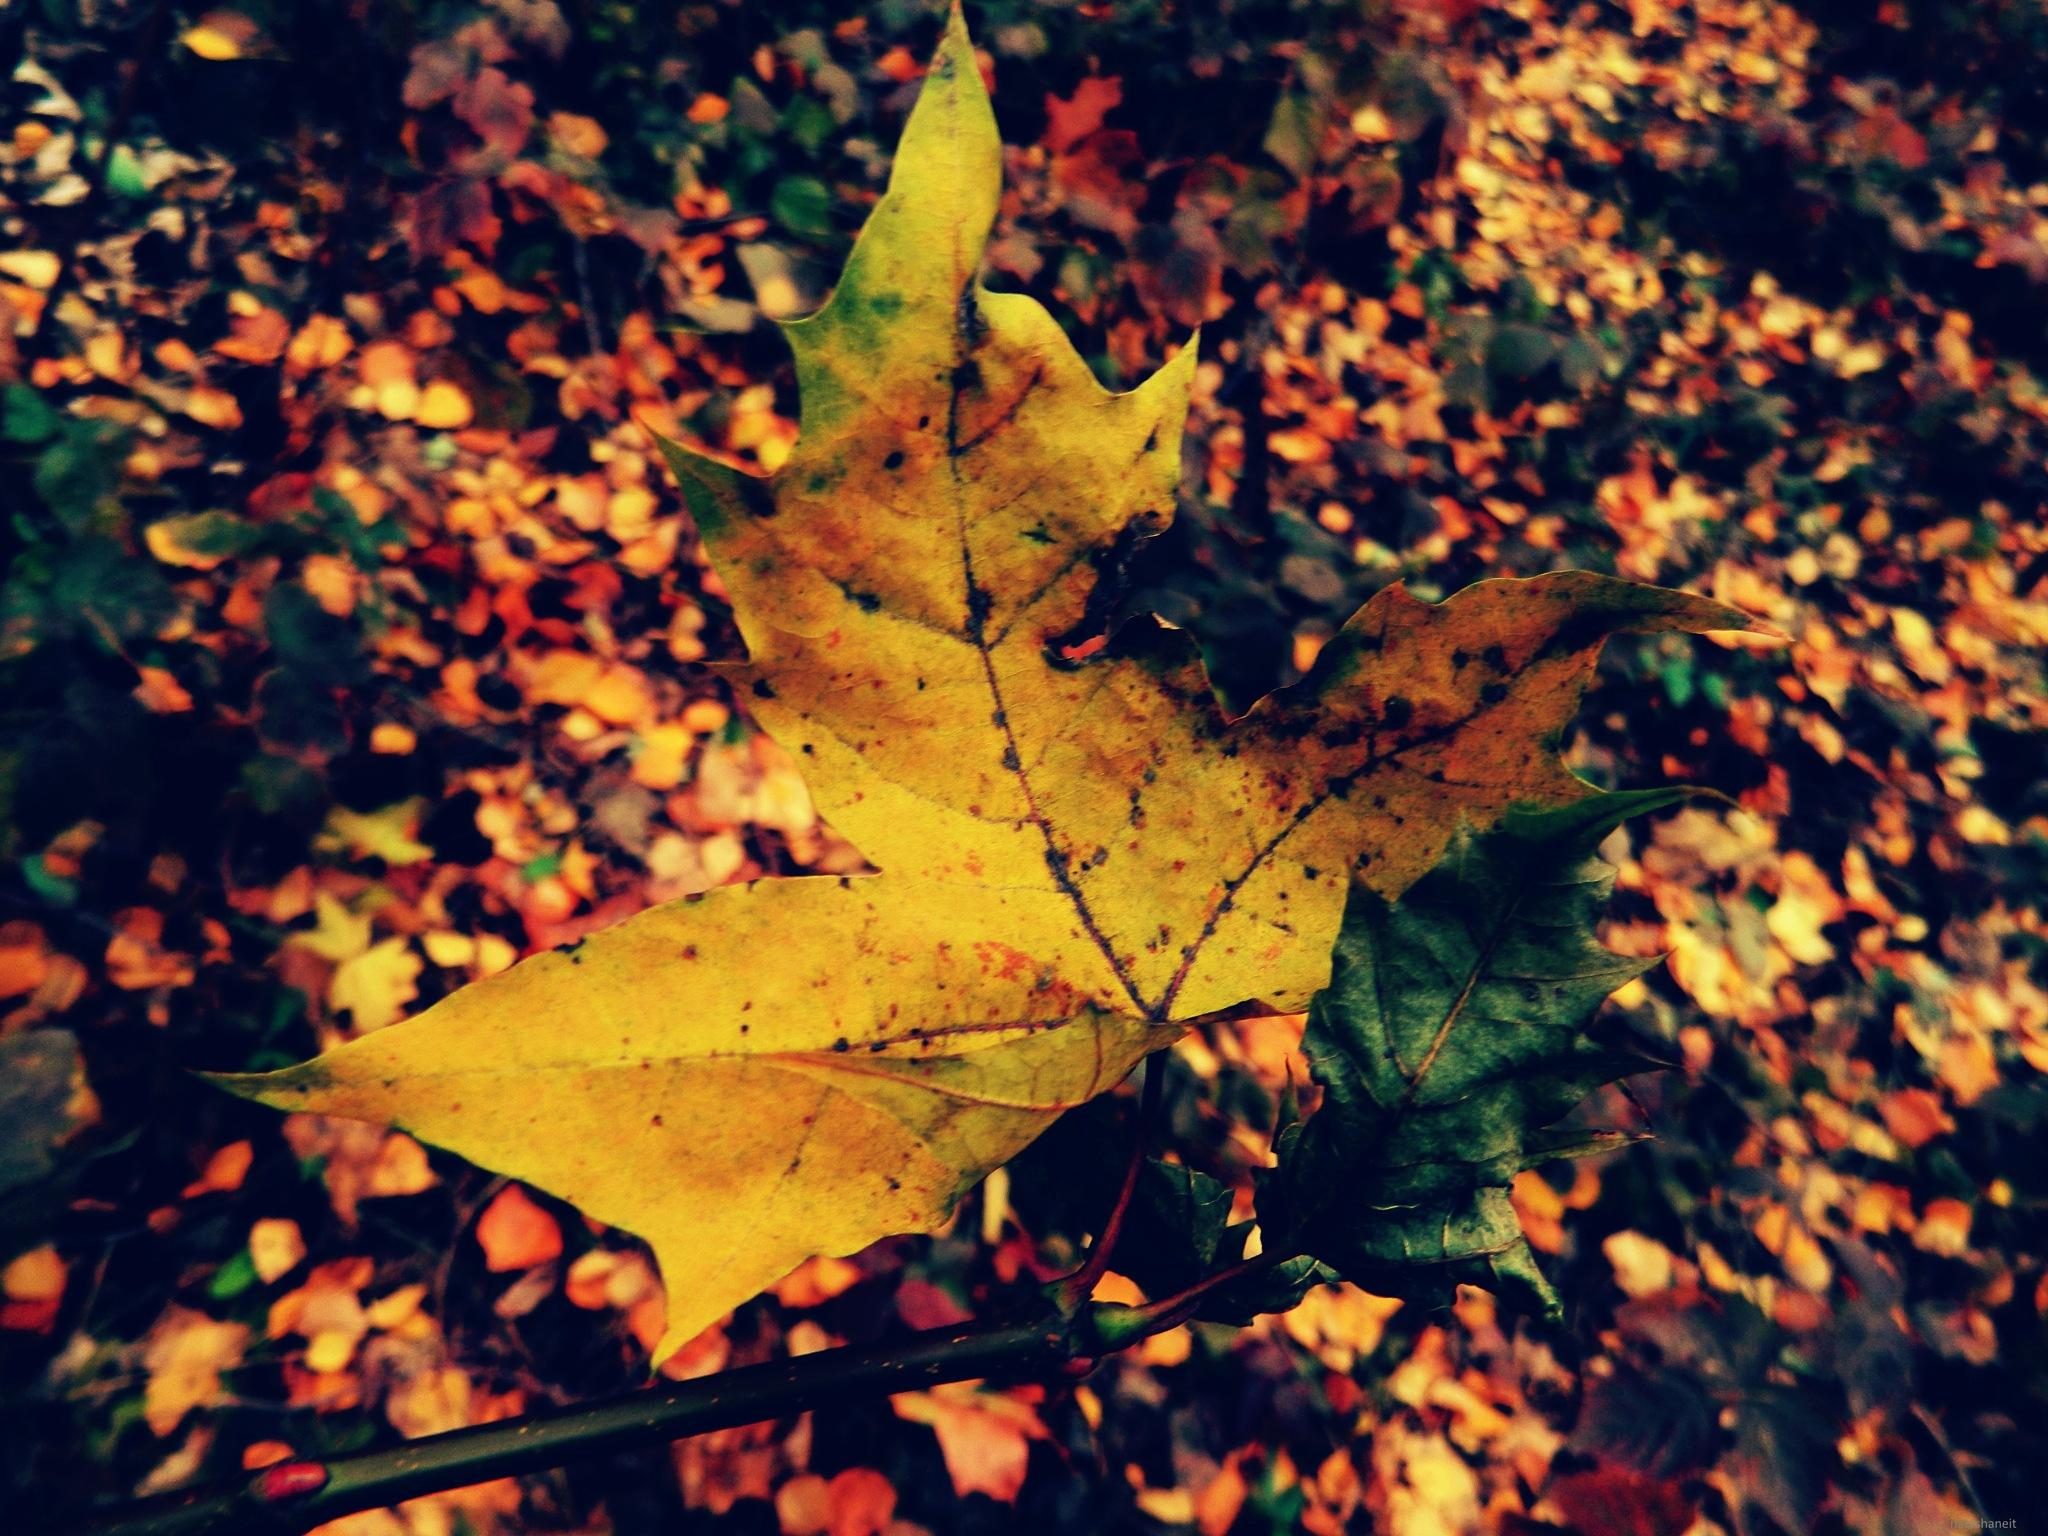 Maple leaf by natashaneit